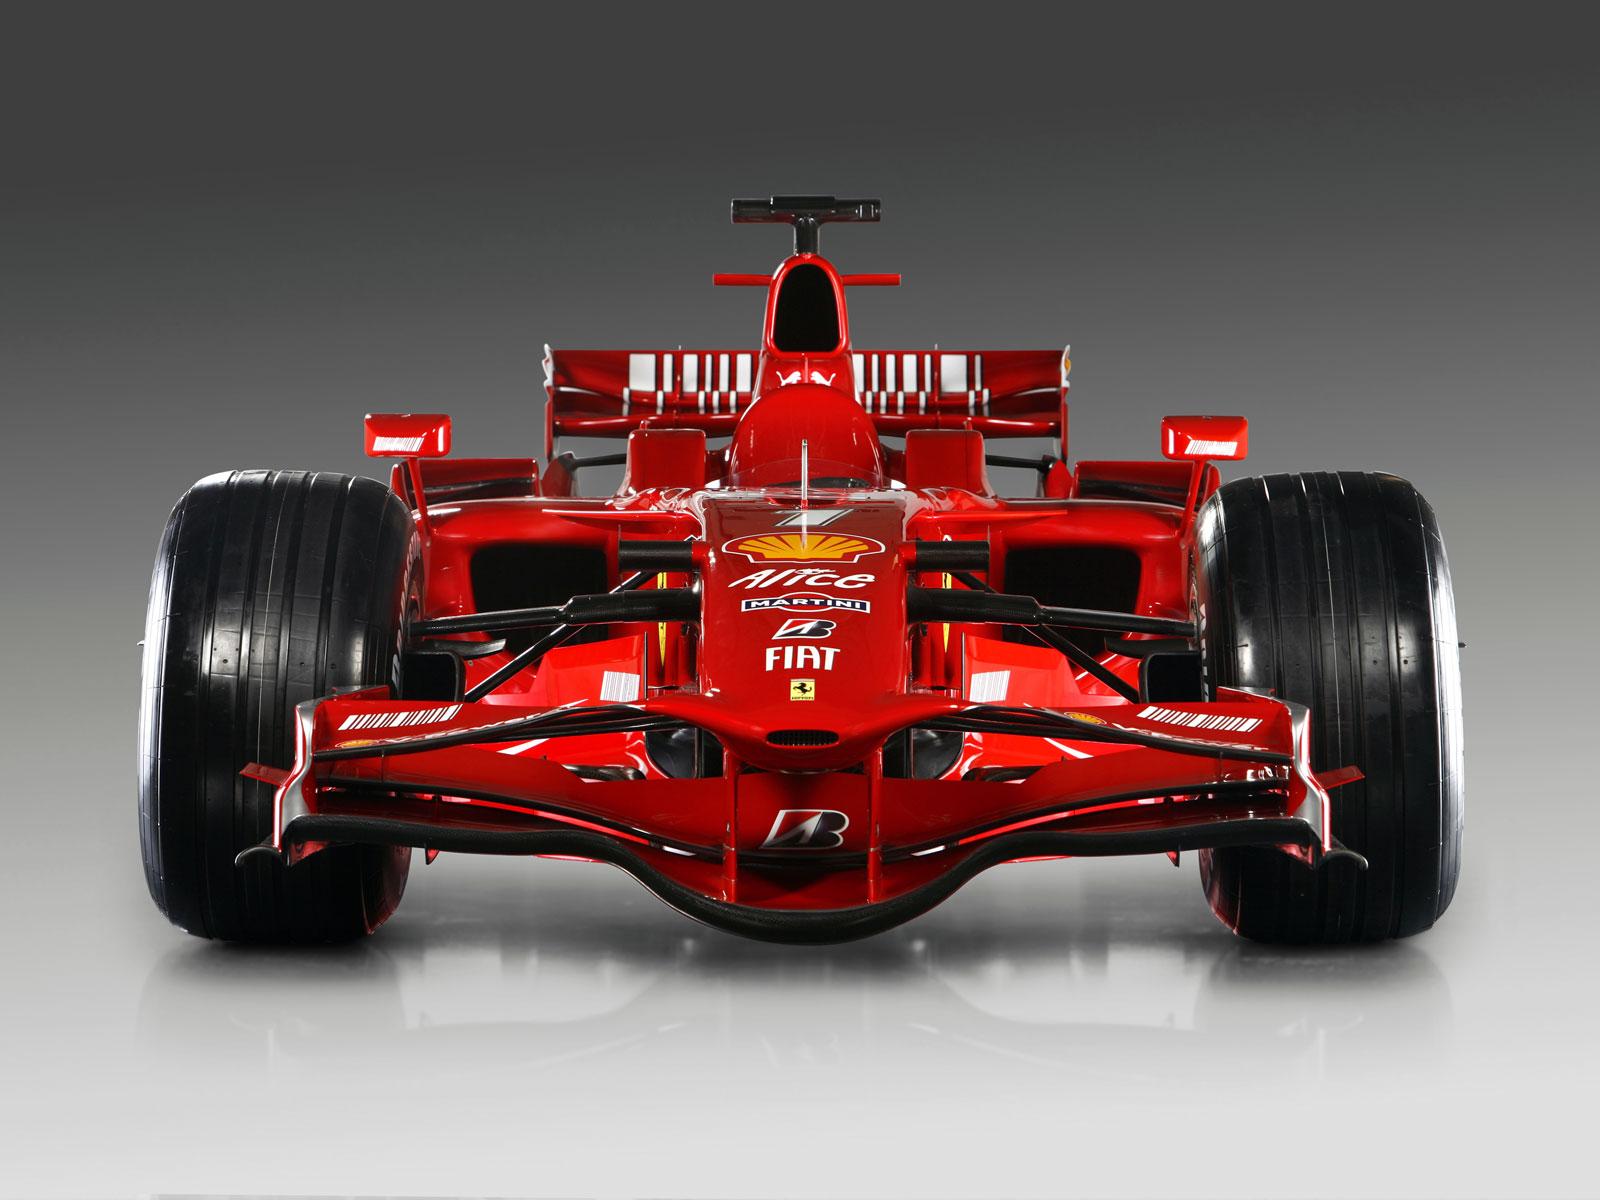 Hd Racing Cars Wallpapers